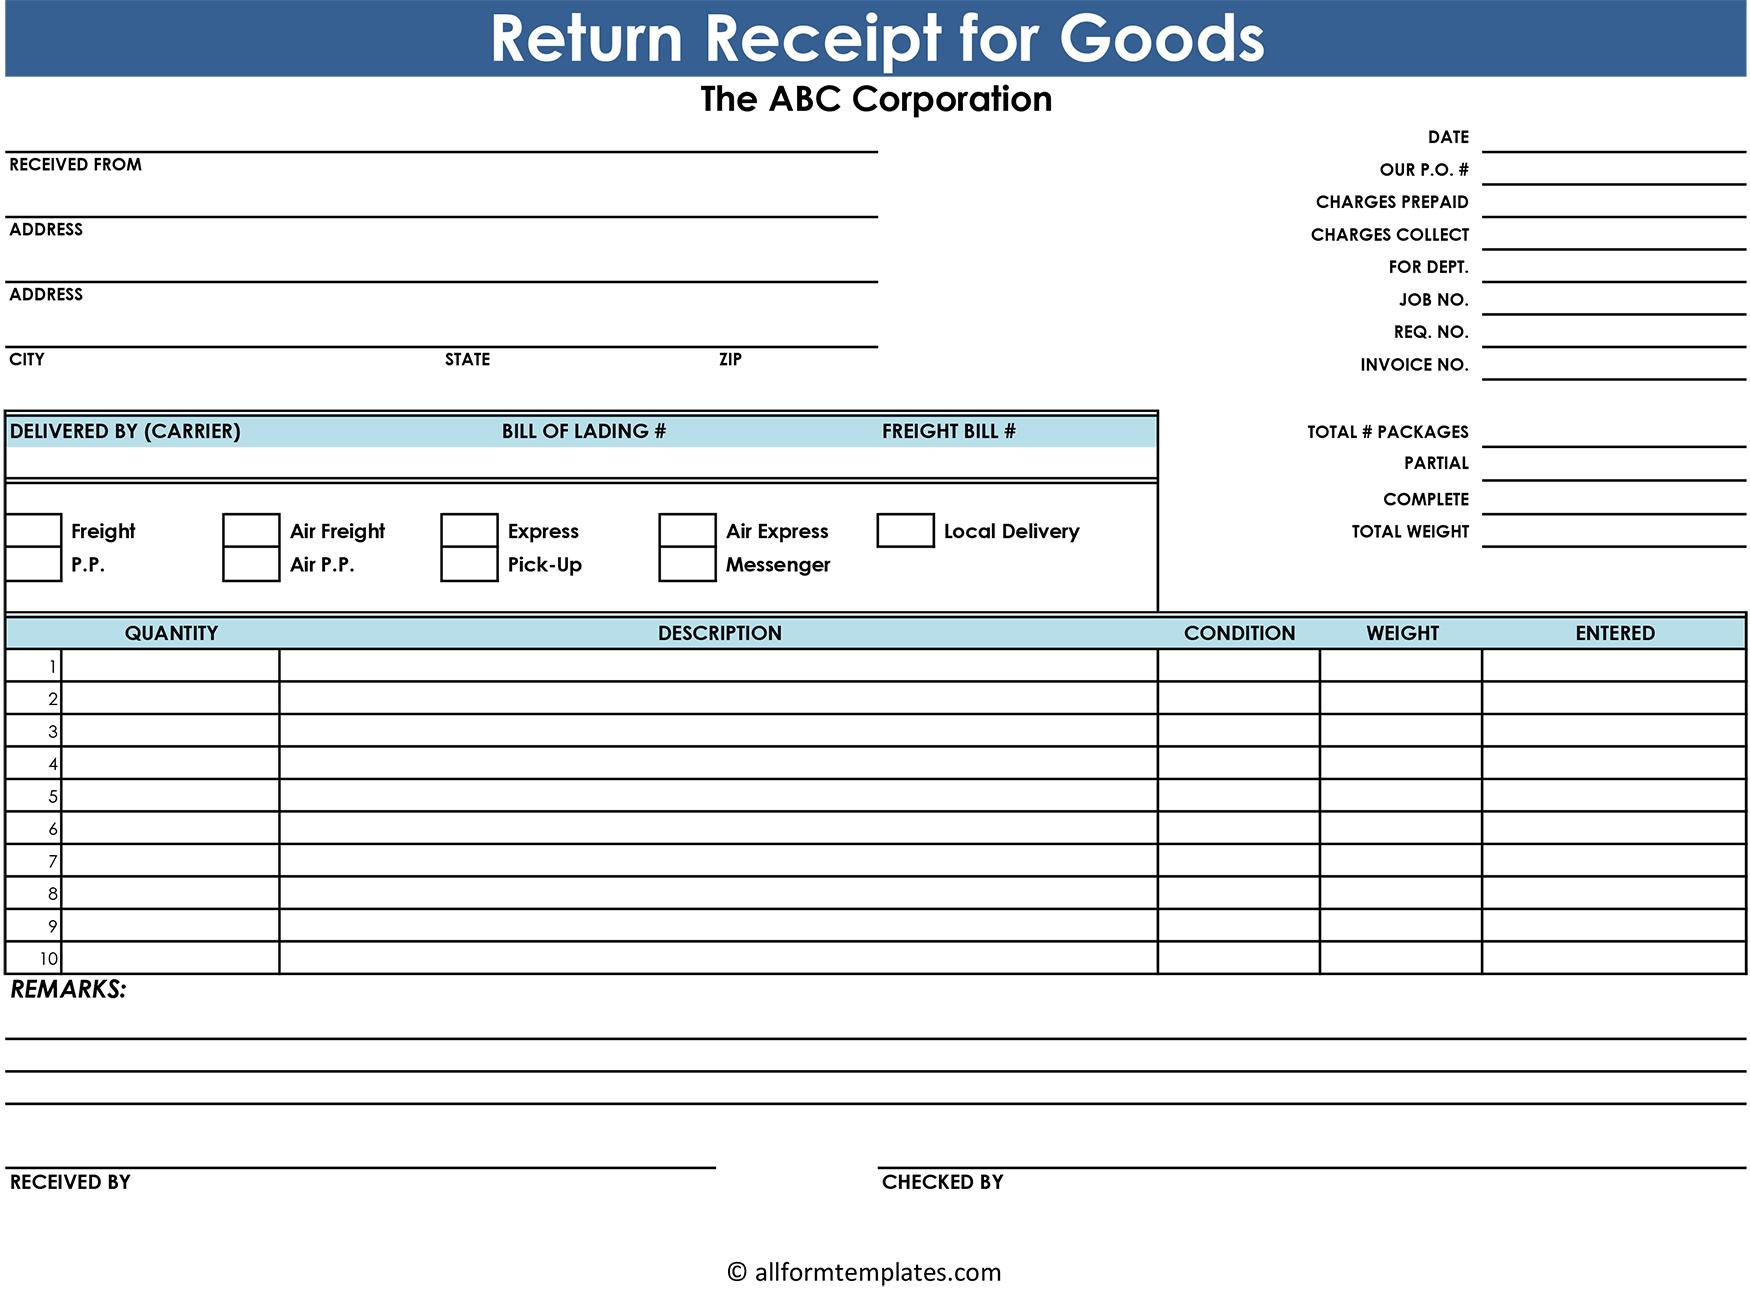 Return-Good-Receipt-HD